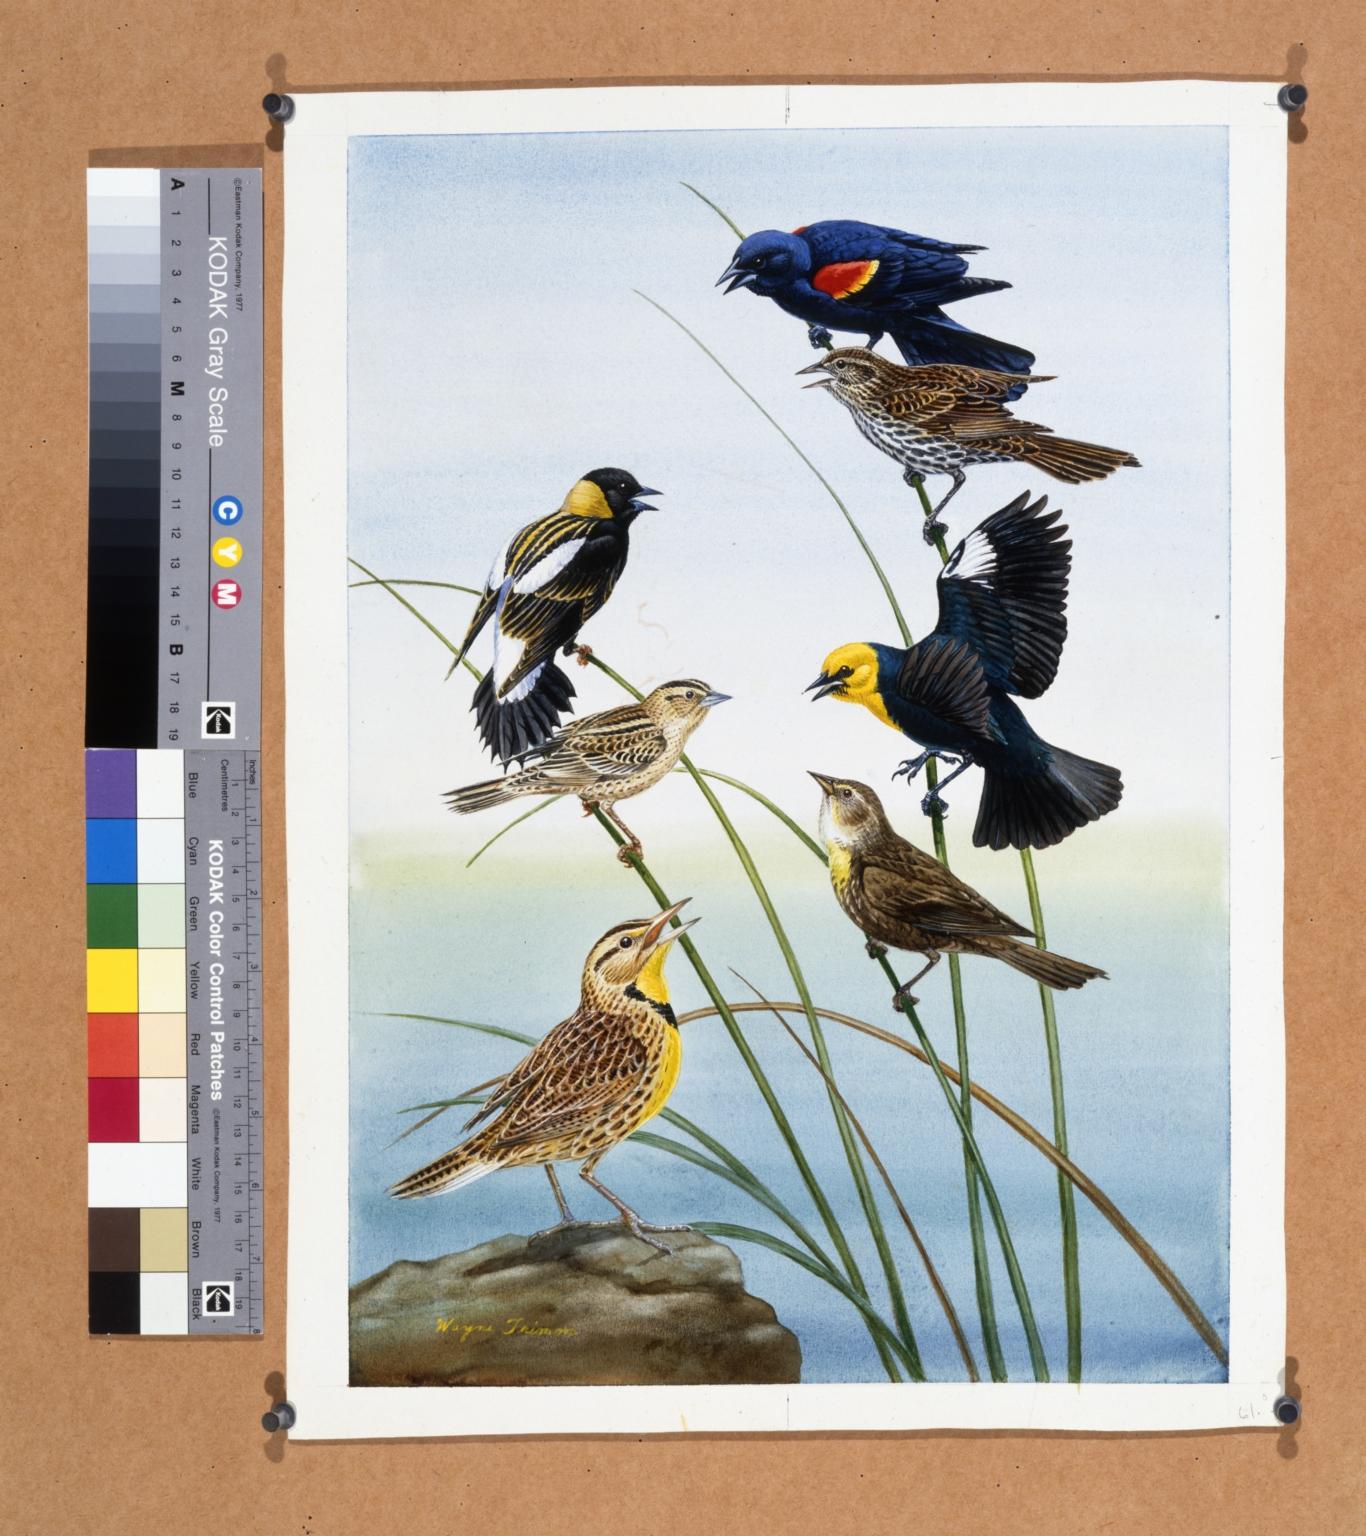 Red-winged Blackbird, Bobolink, and Western Meadowlark.